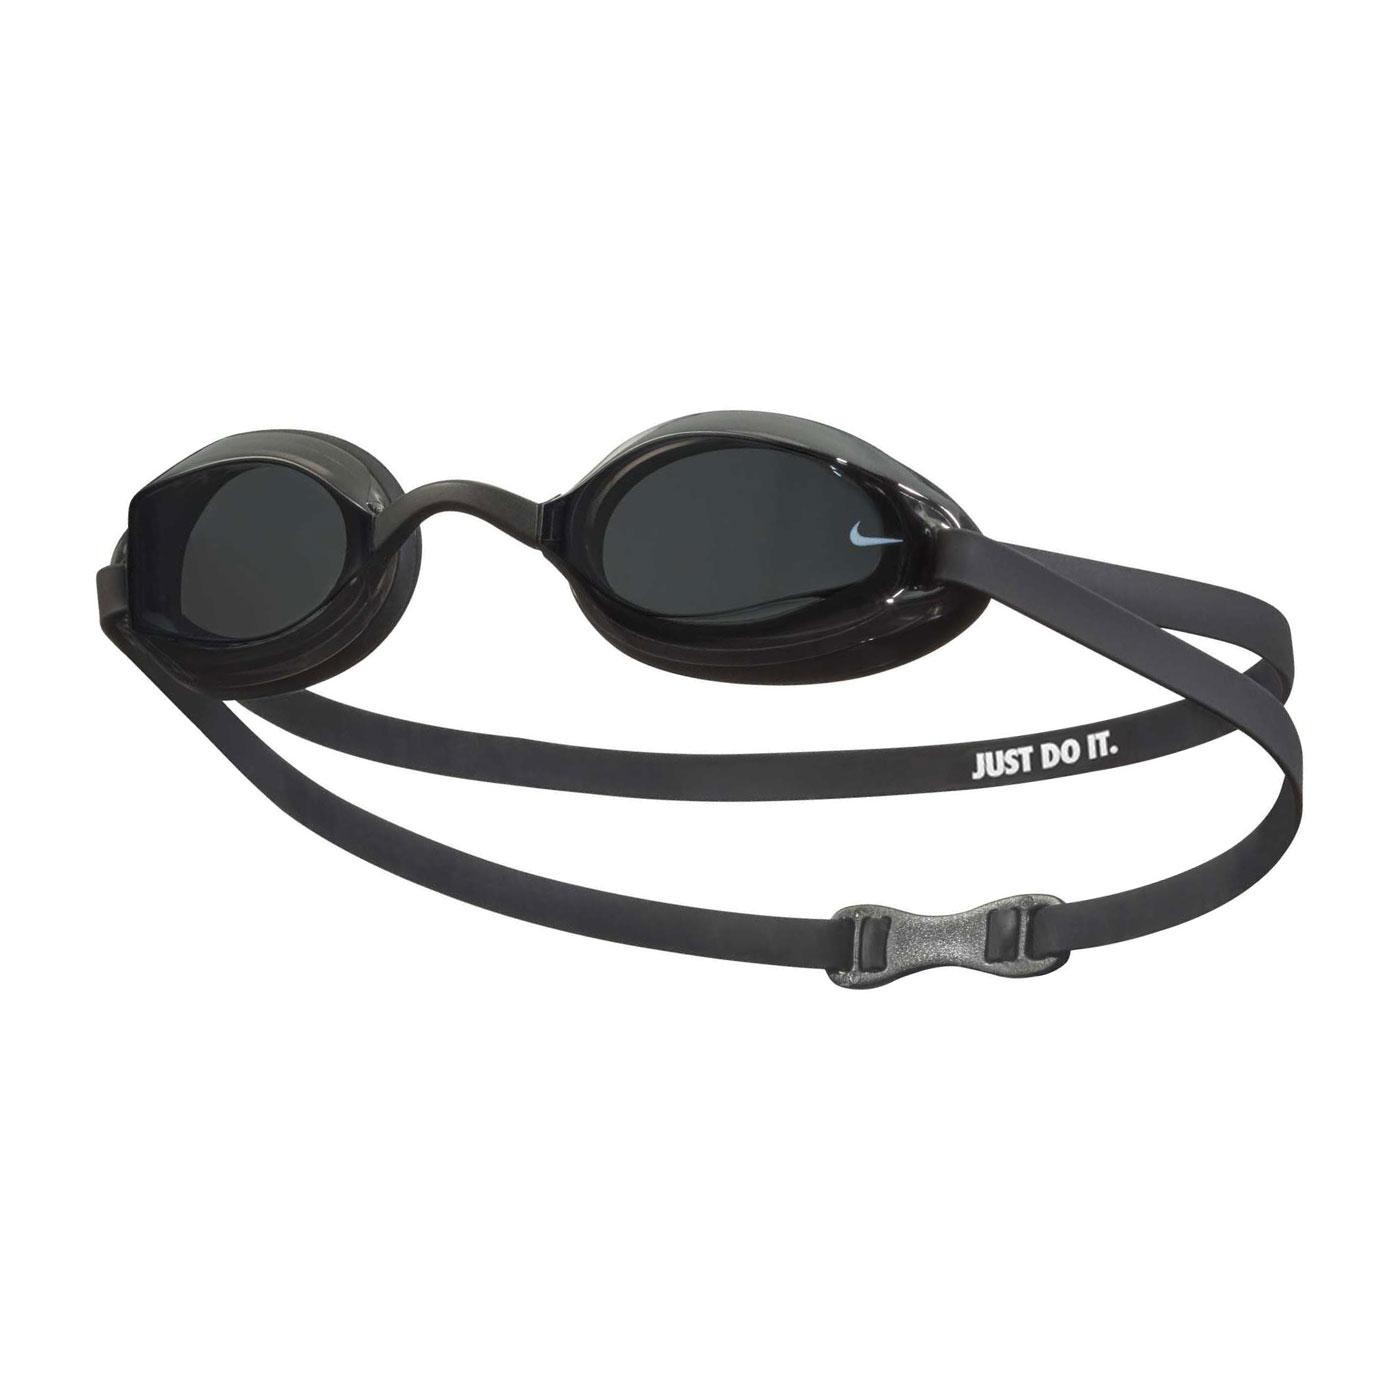 NIKE SWIM 成人專業型泳鏡 NESSA179-014 - 黑白